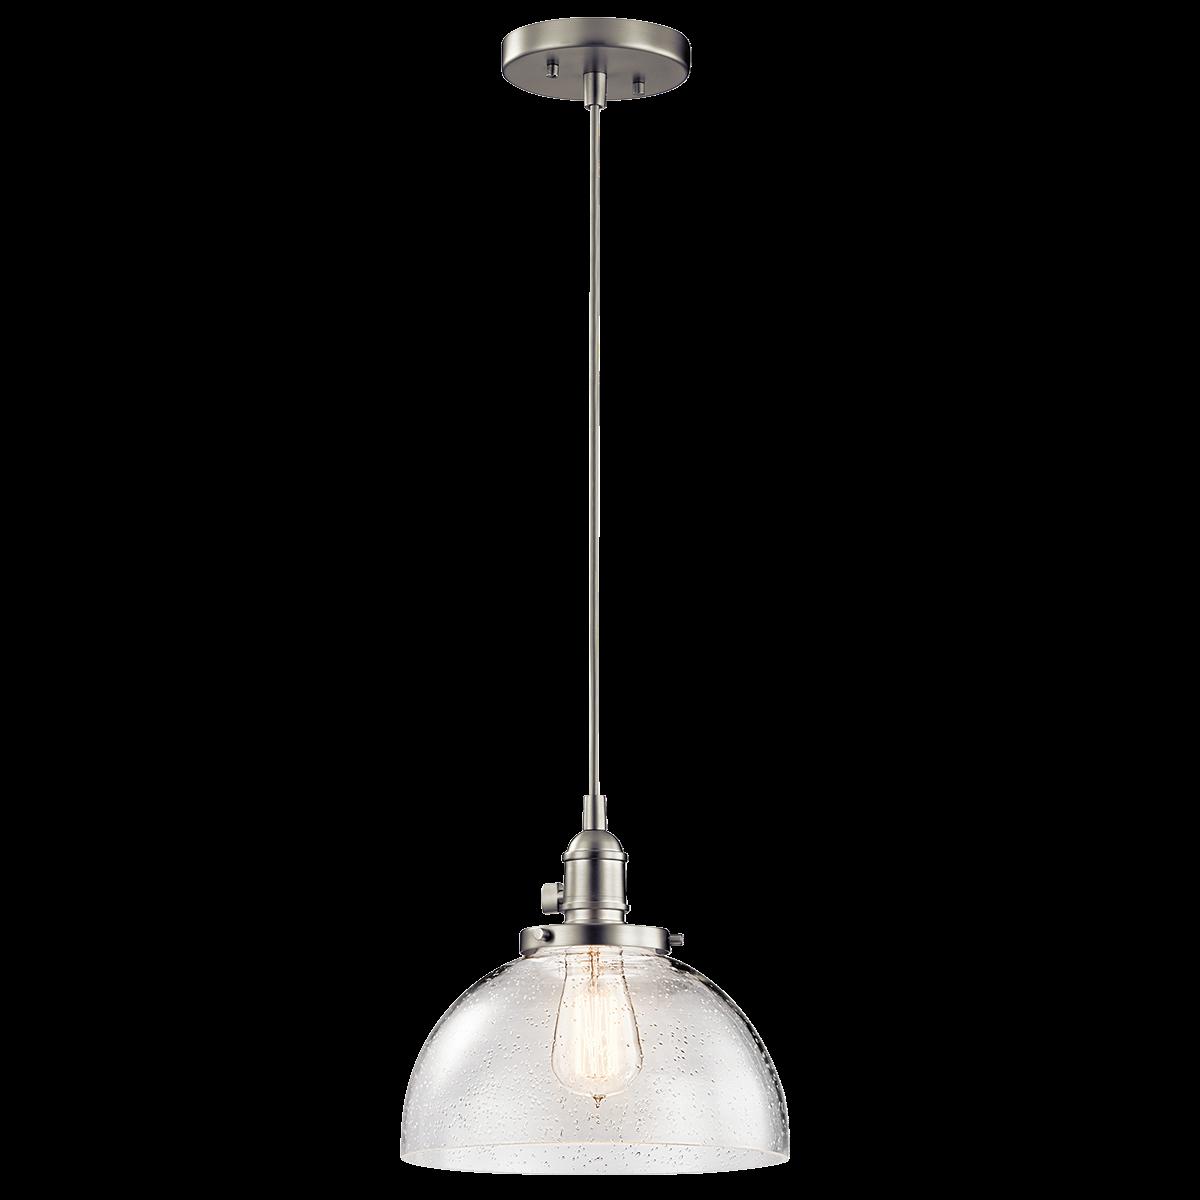 1 Light Avery Mini Pendant - Brushed Nickel kitchen island | Shit ... for House Light Png  10lpwja